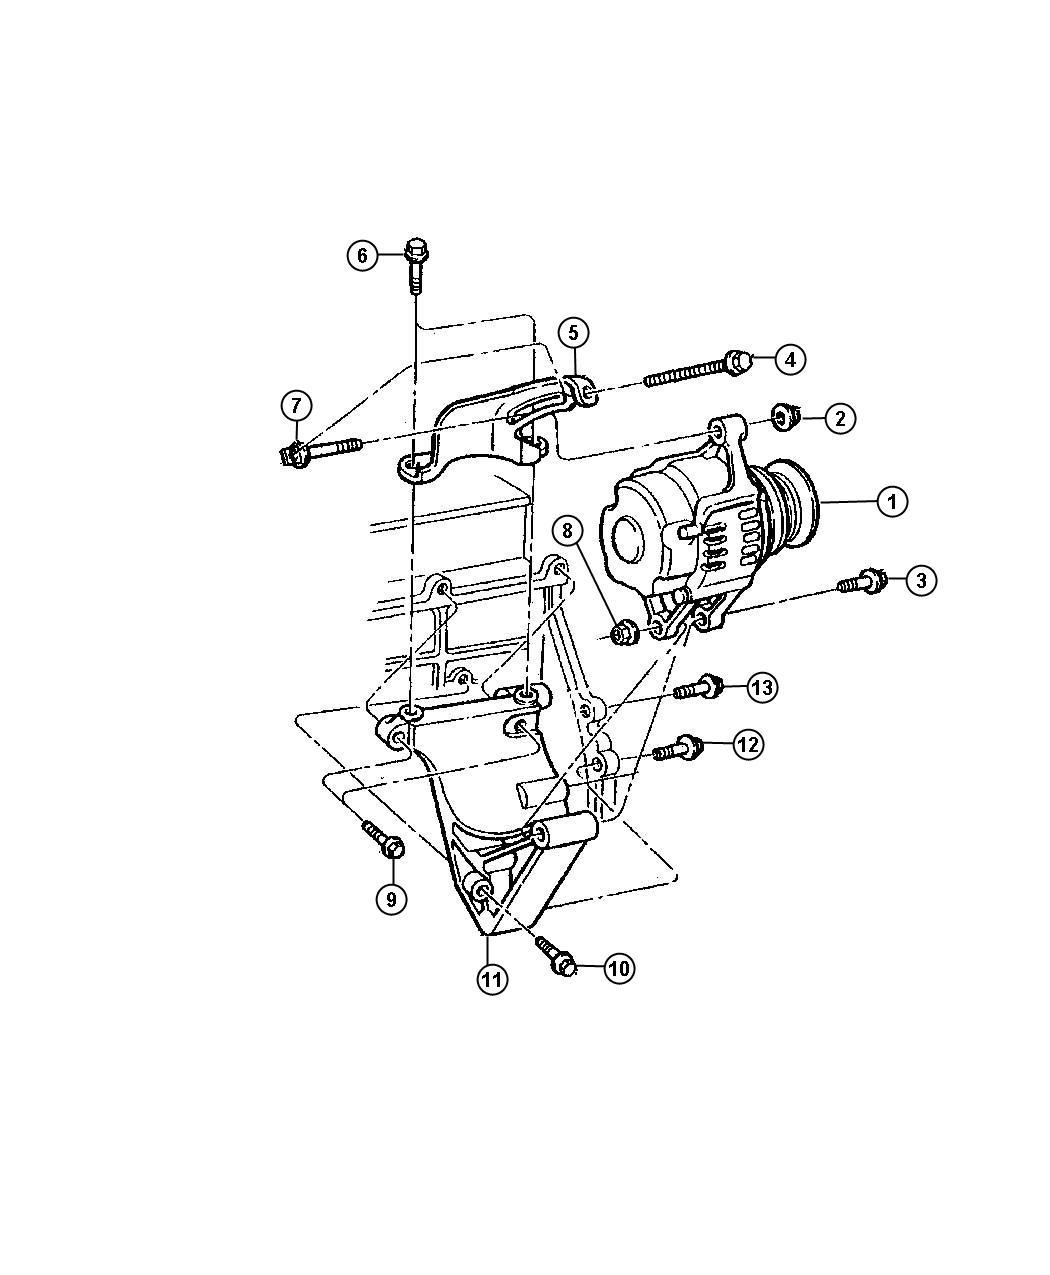 Service manual [1996 Dodge Bolts Alternator Support